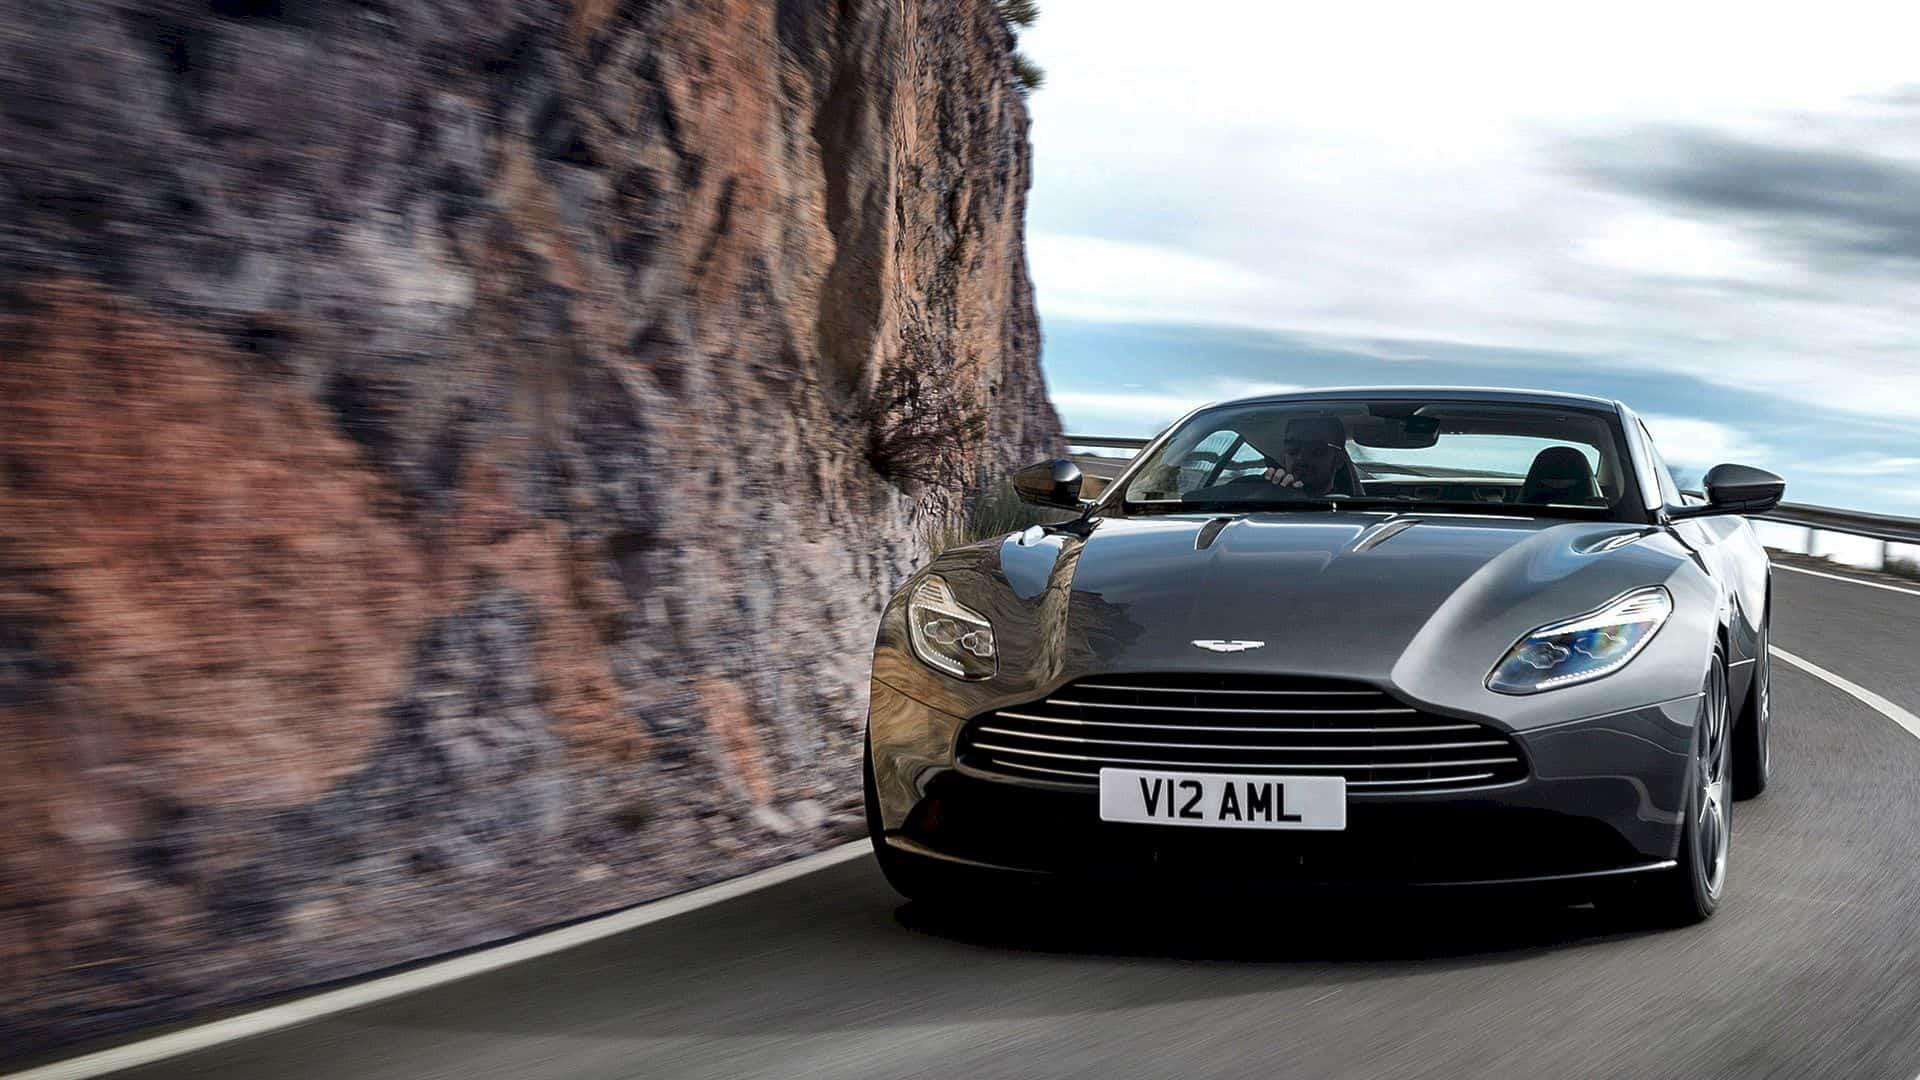 Aston Martin Db 11 6